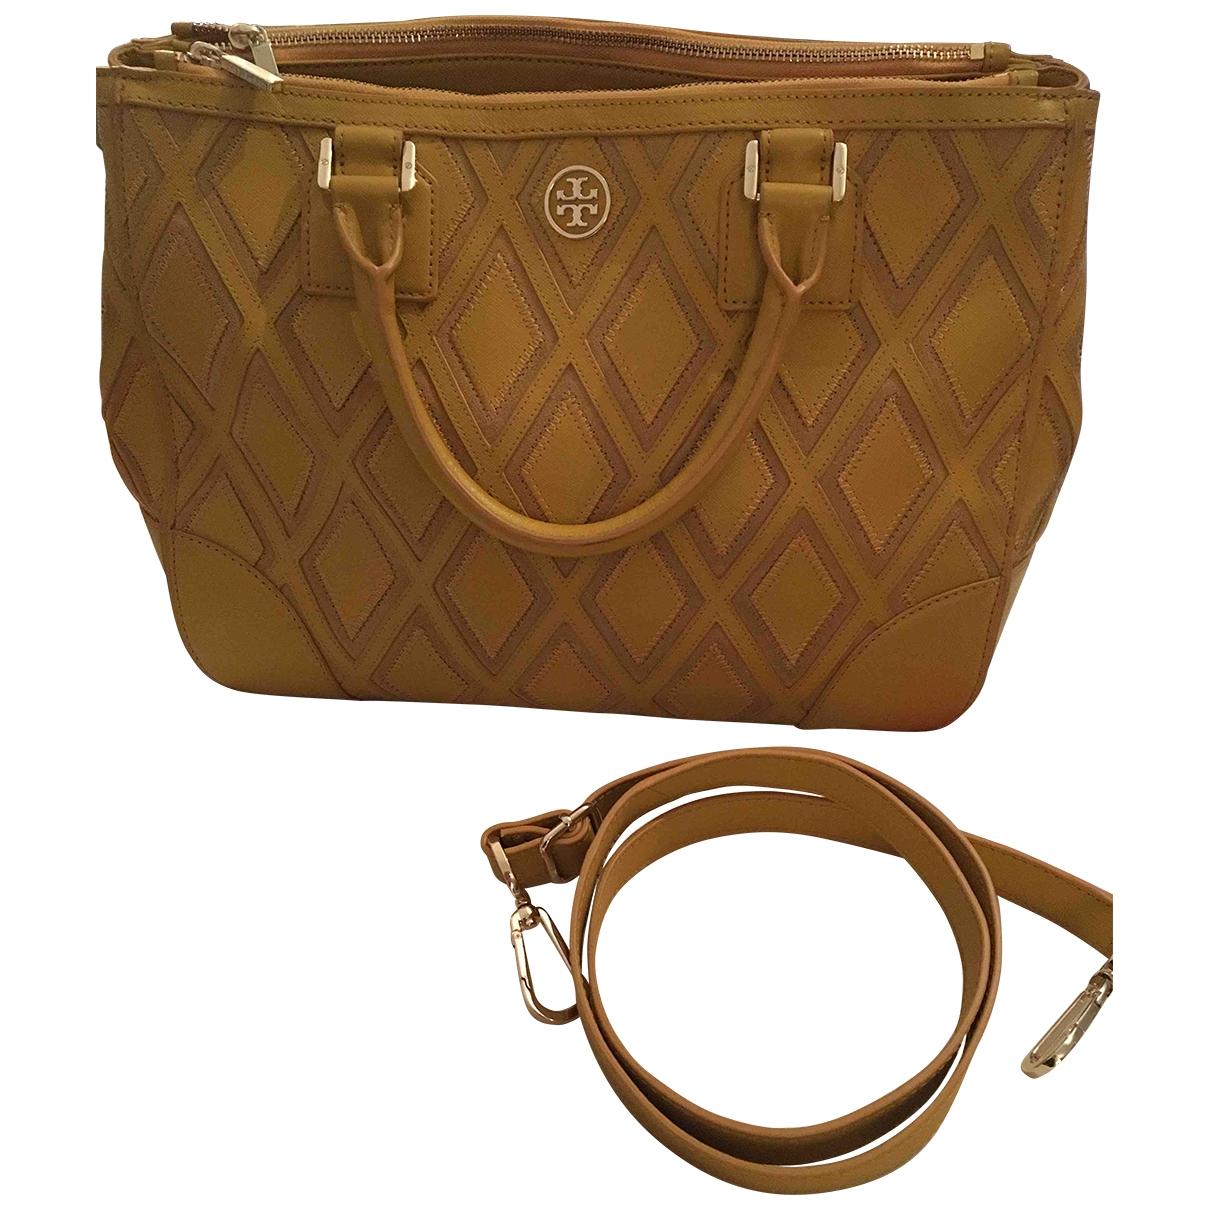 Tory Burch \N Handtasche in  Gelb Leder